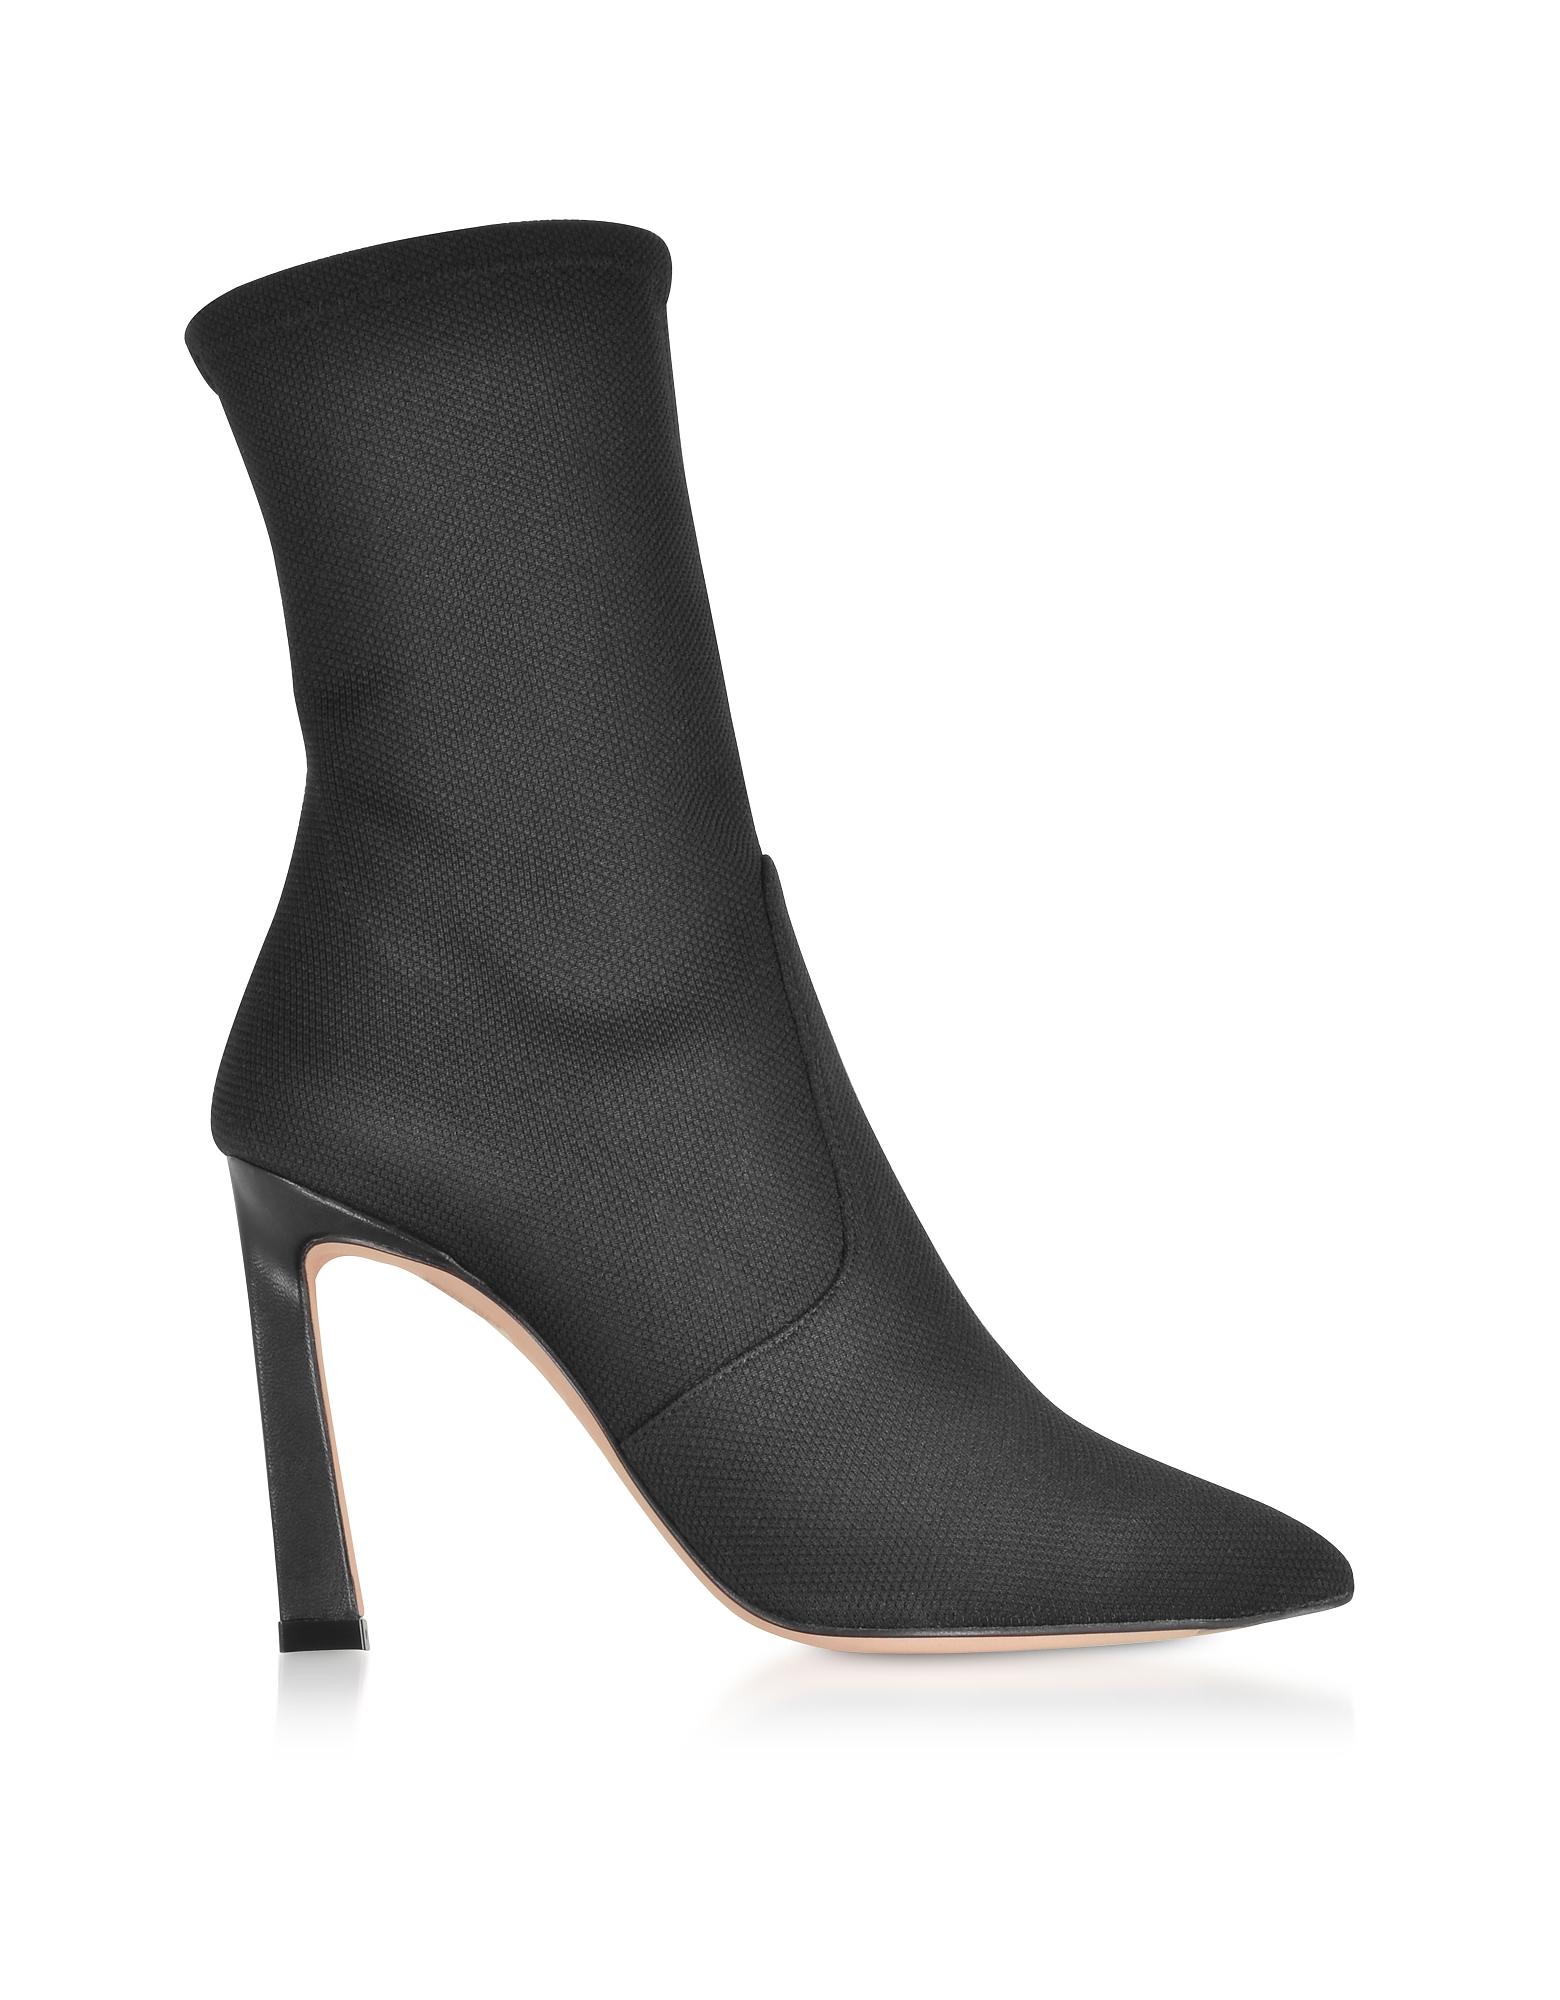 Stuart Weitzman Shoes, Rapture 100 Black Canvas High Heel Boots